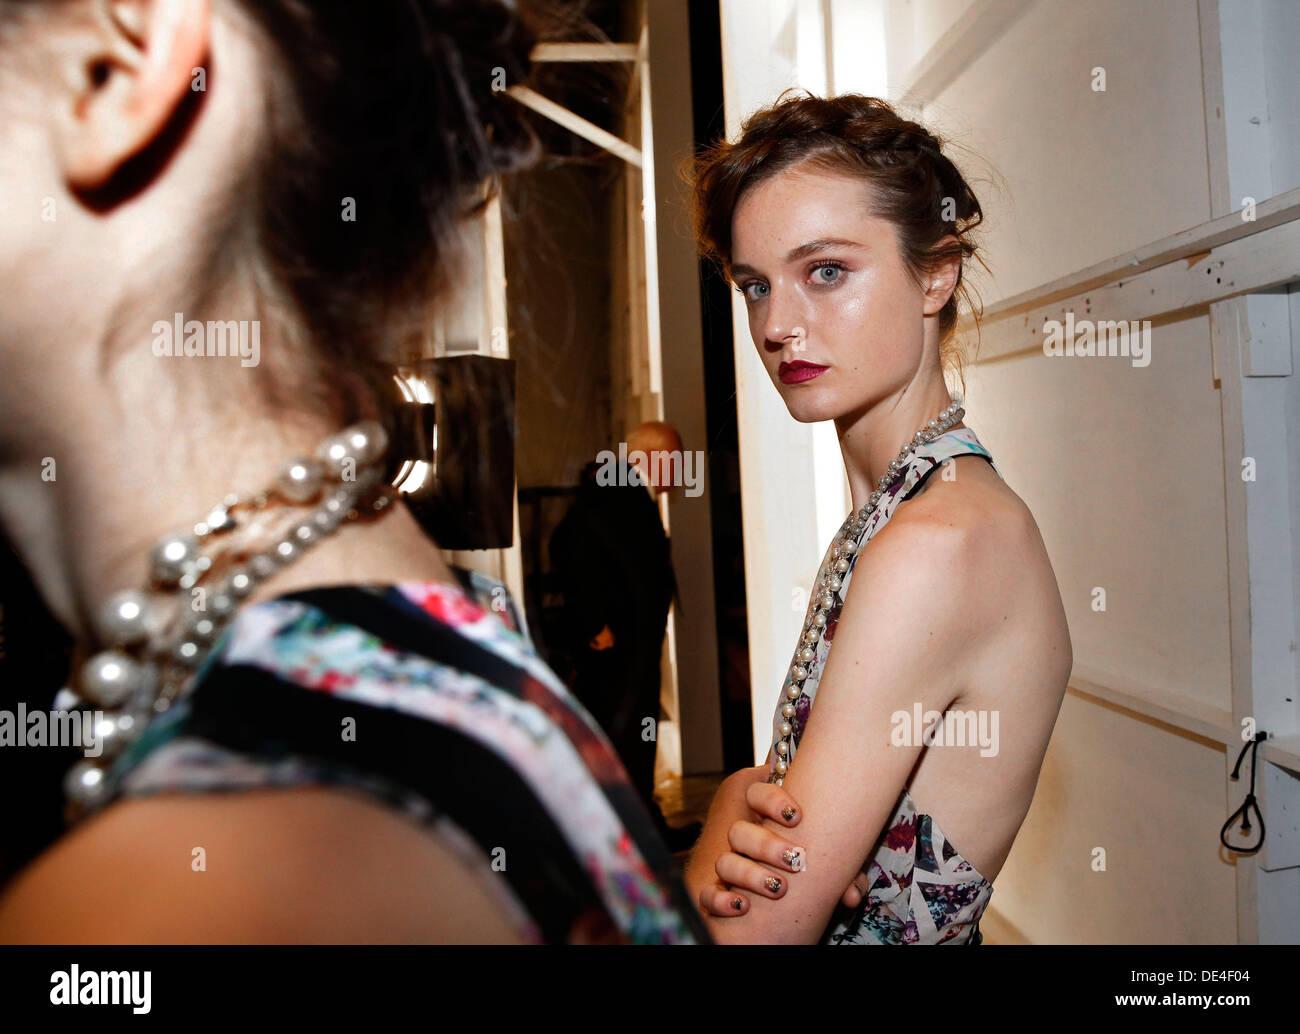 New York, NY, USA. 10e Août, 2013. Les coulisses de modèles MBFW à New York City. Crédit: Scott Houston/Alamy Live News Photo Stock